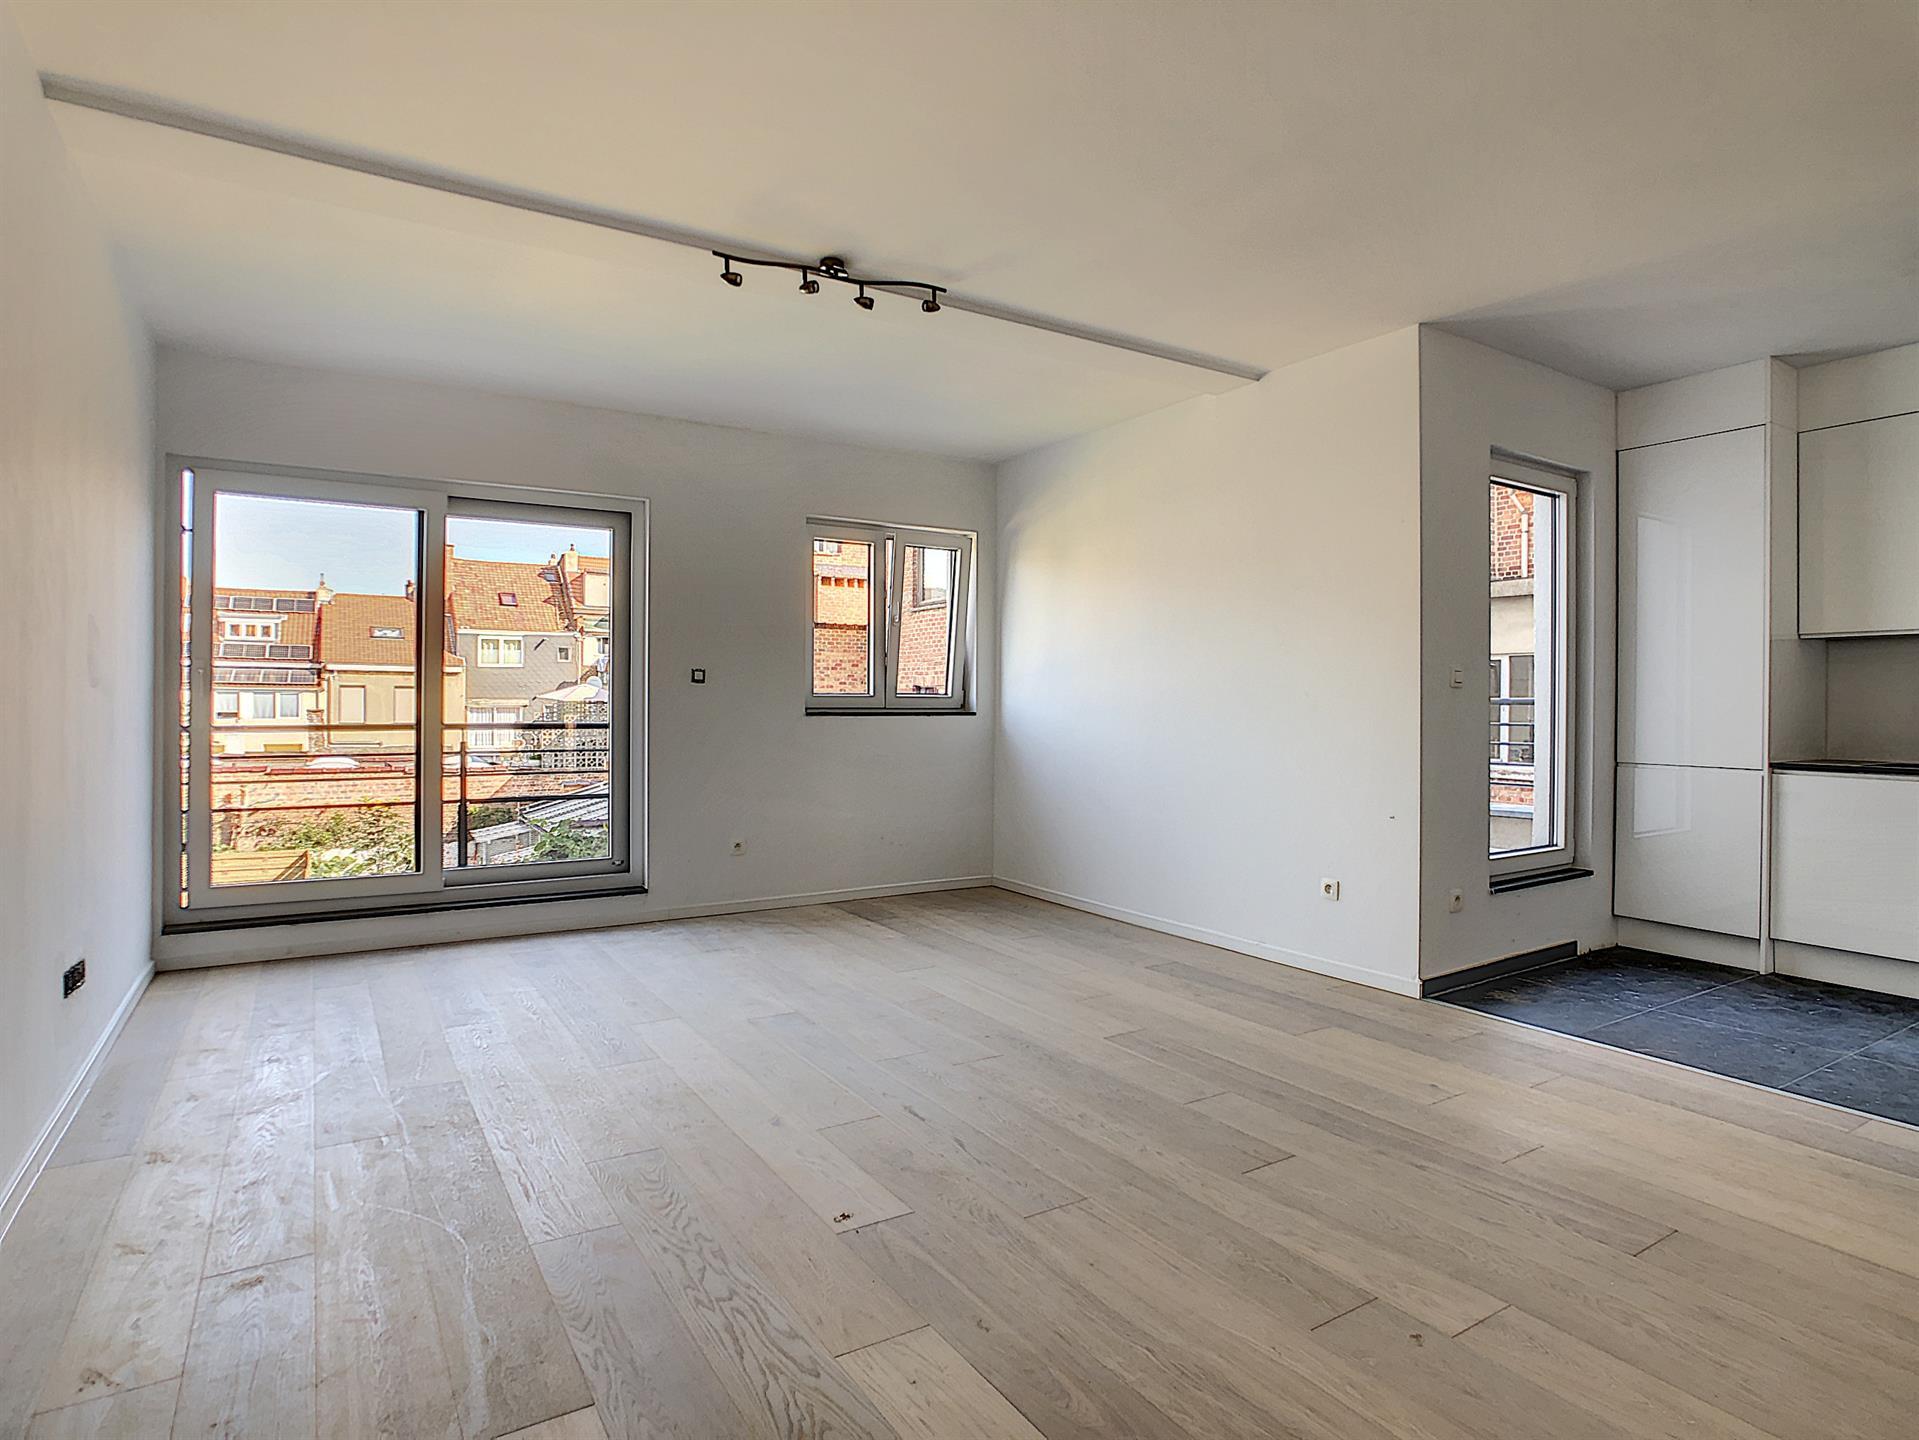 Appartement - Anderlecht - #4252375-30